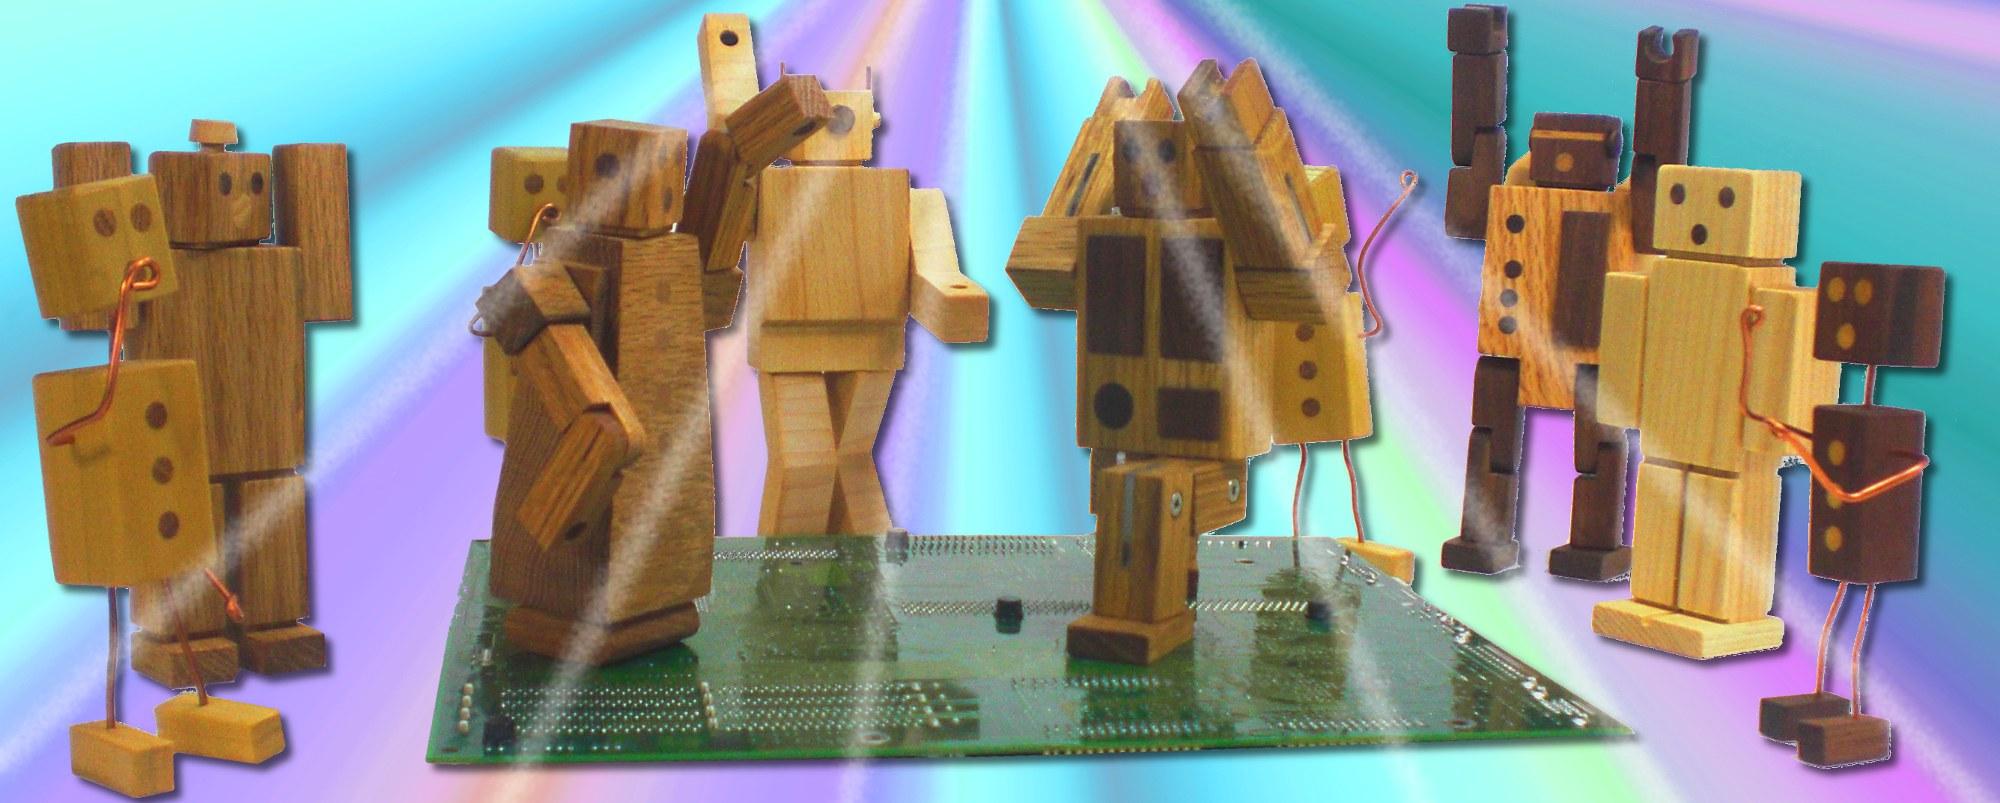 wooden robot toys dancing